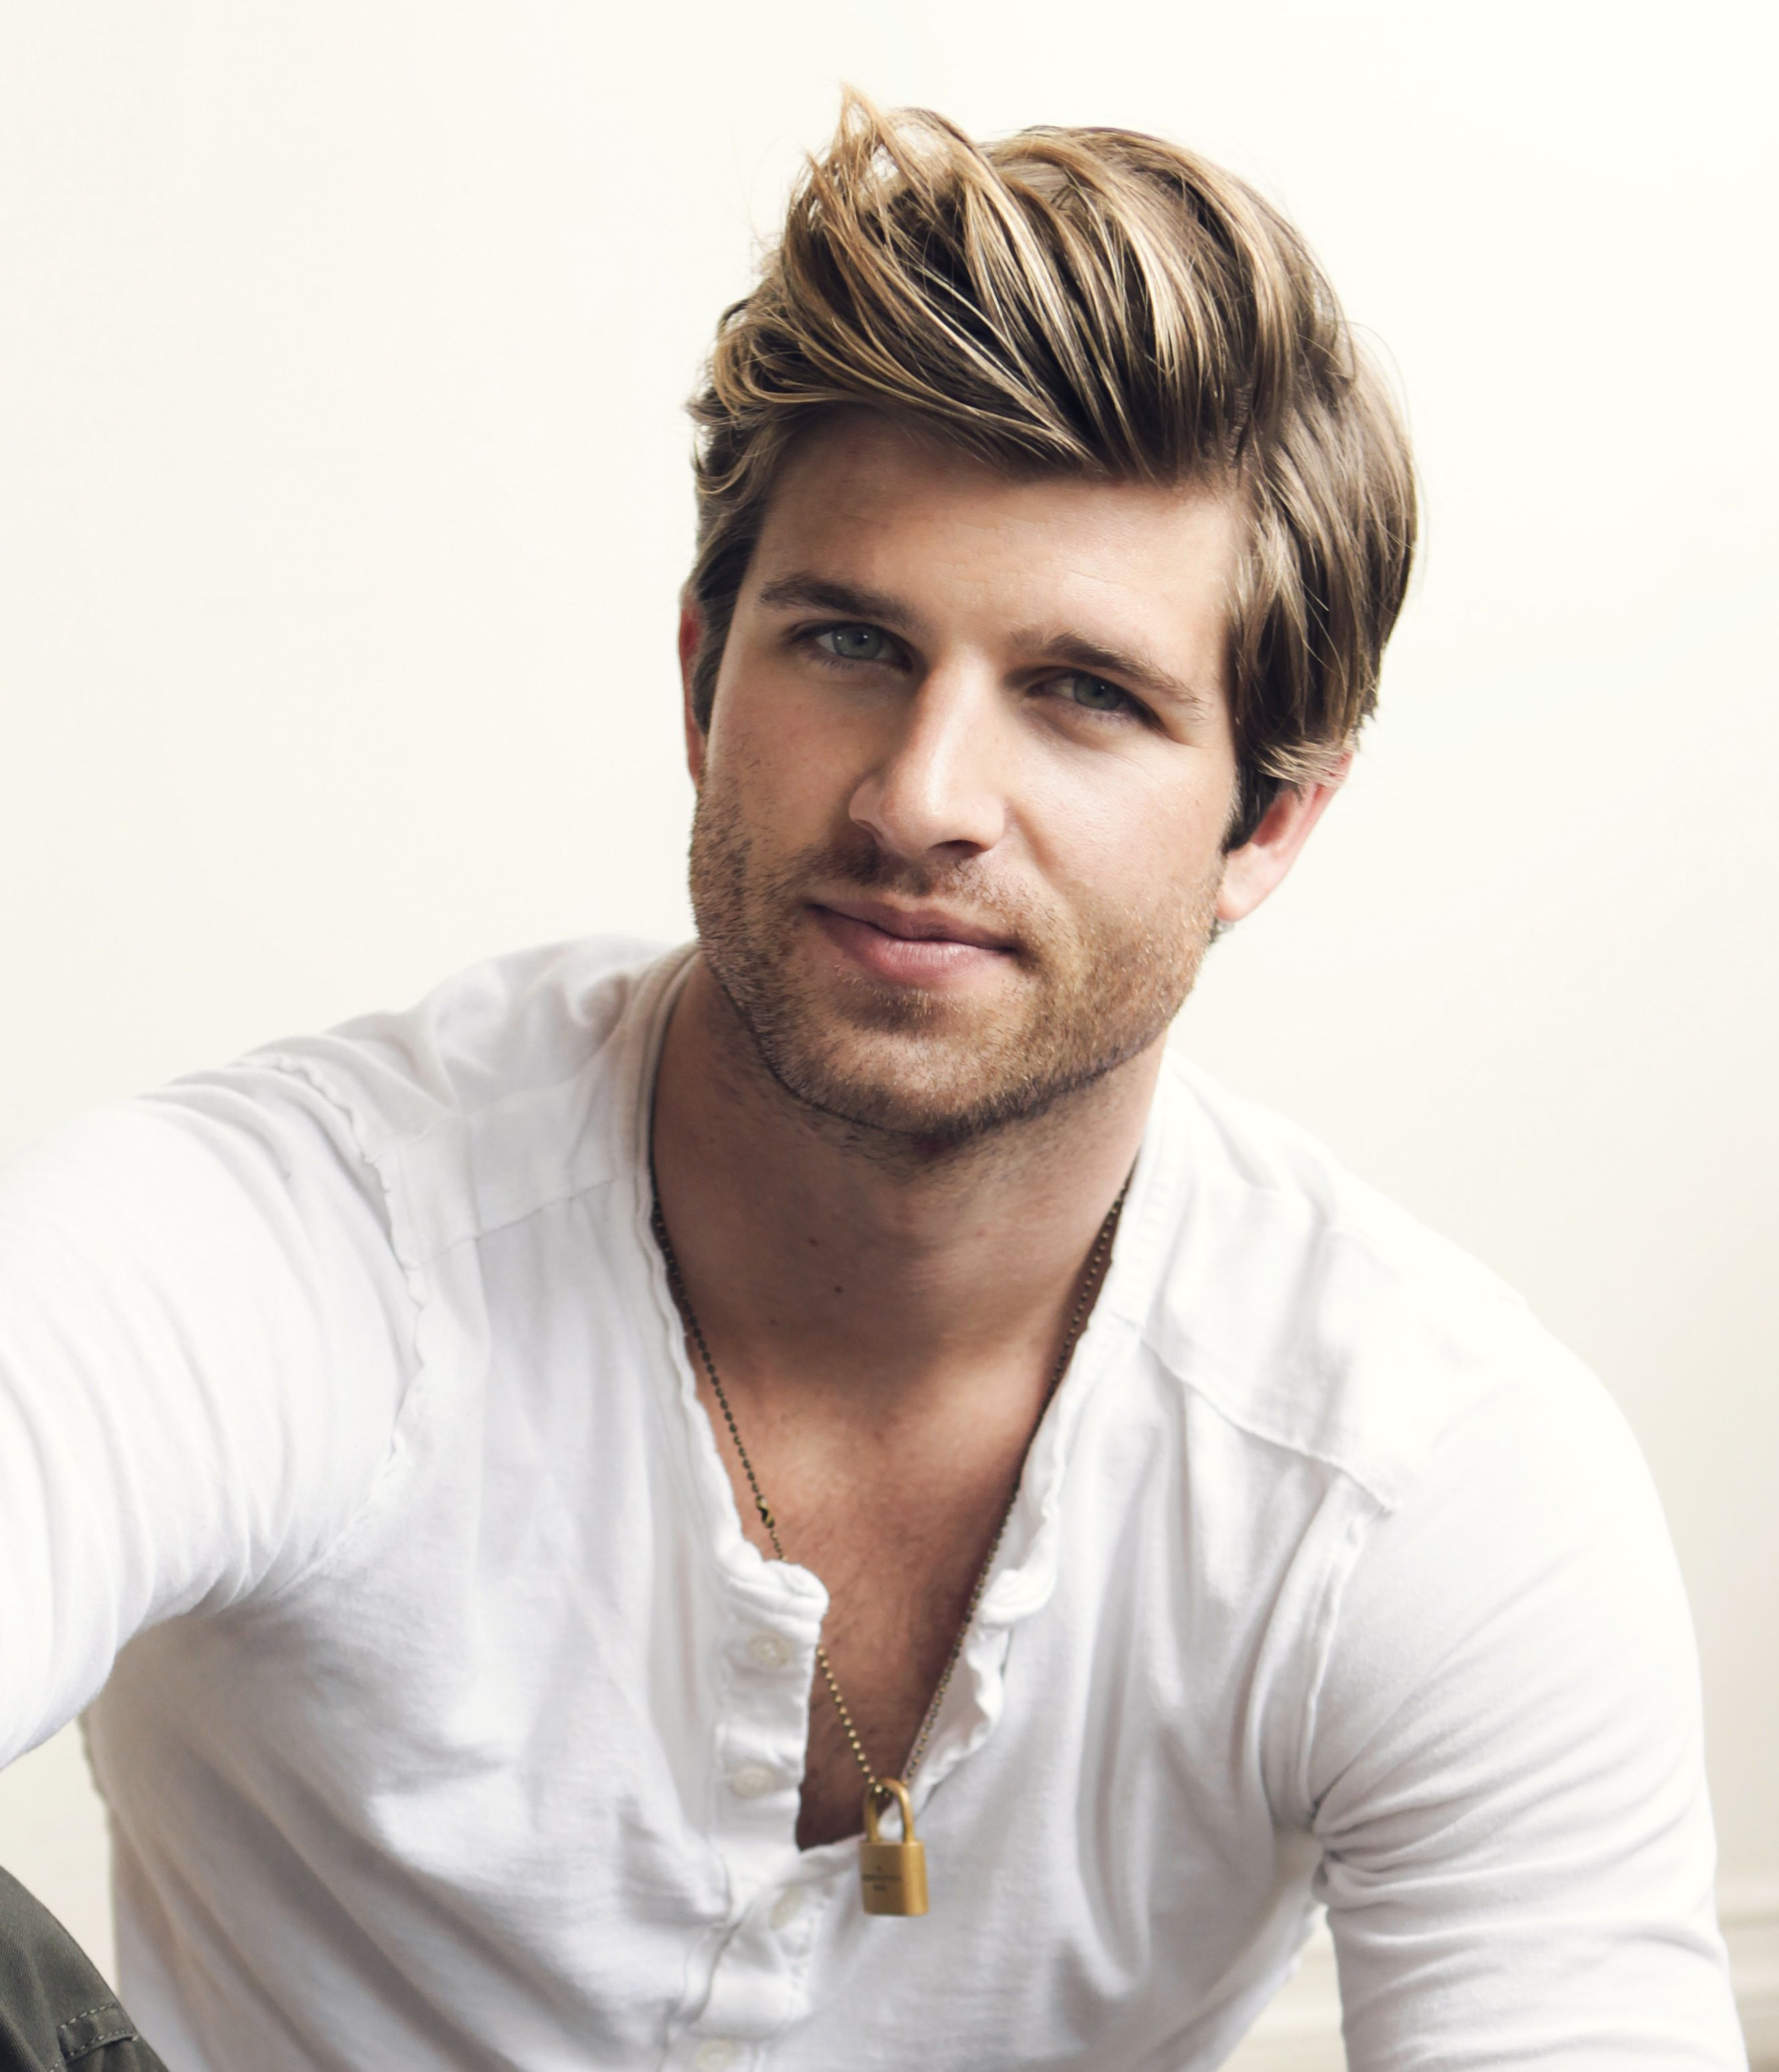 male clothing model headshot - Google Search | Headshot - Male ...